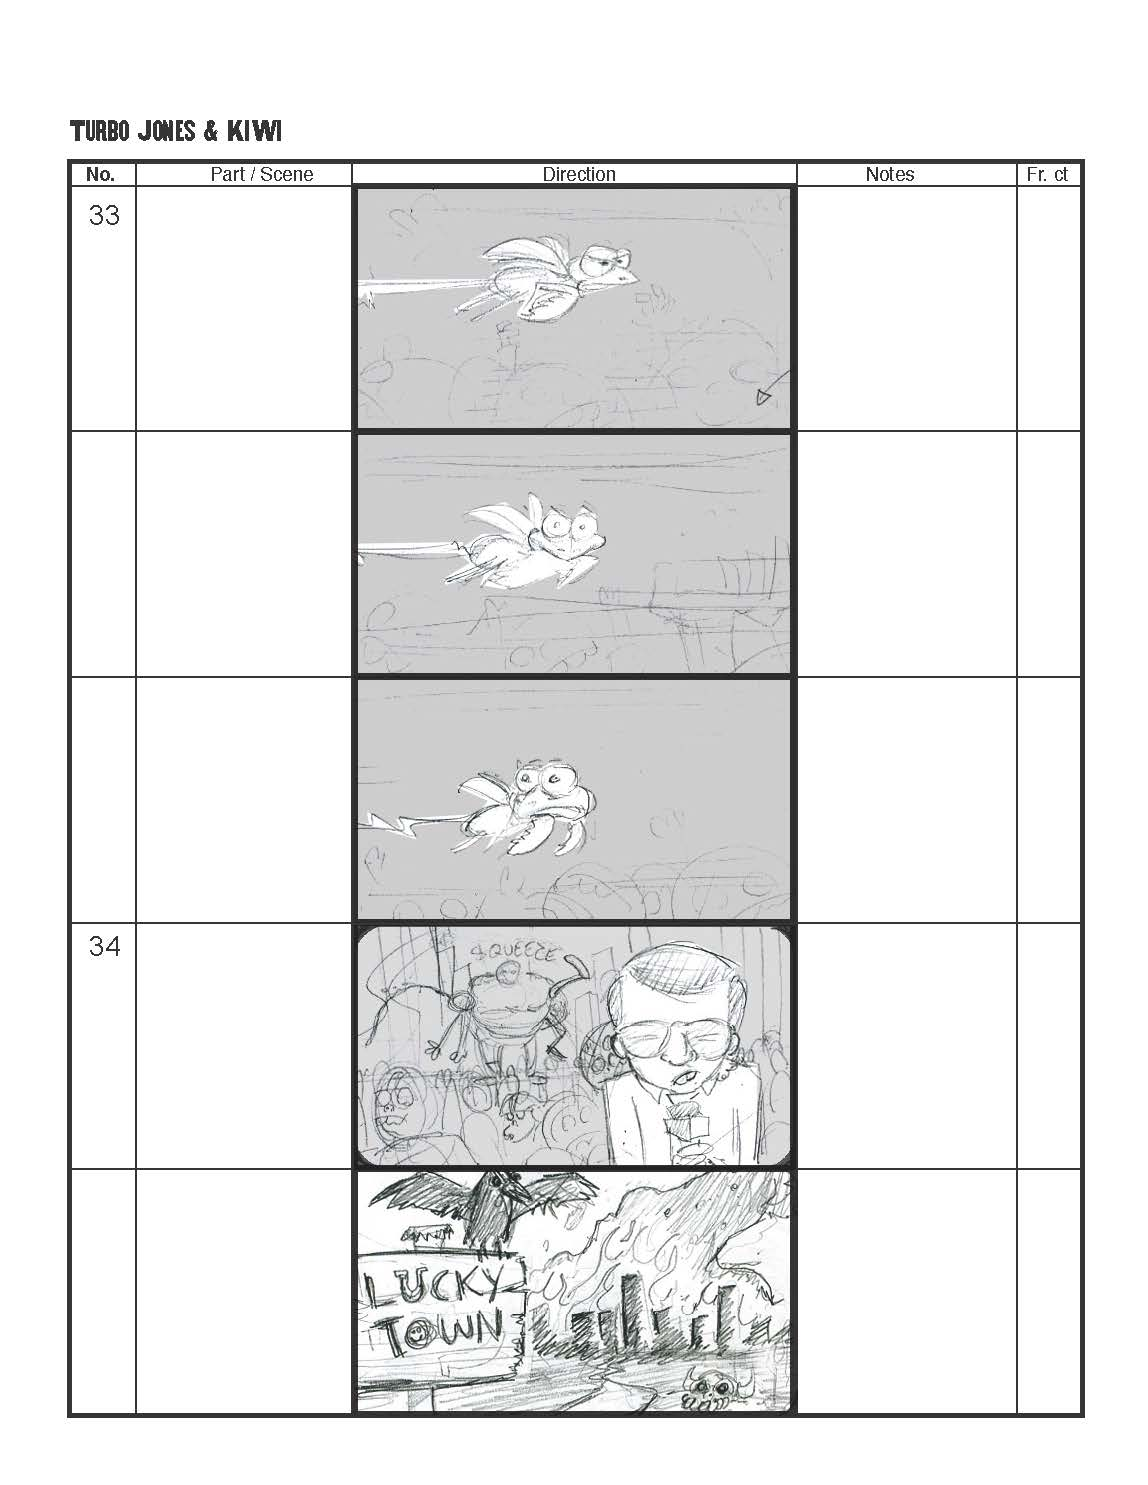 TJK_Storyboards_v01_HIGH_Page_18.jpg